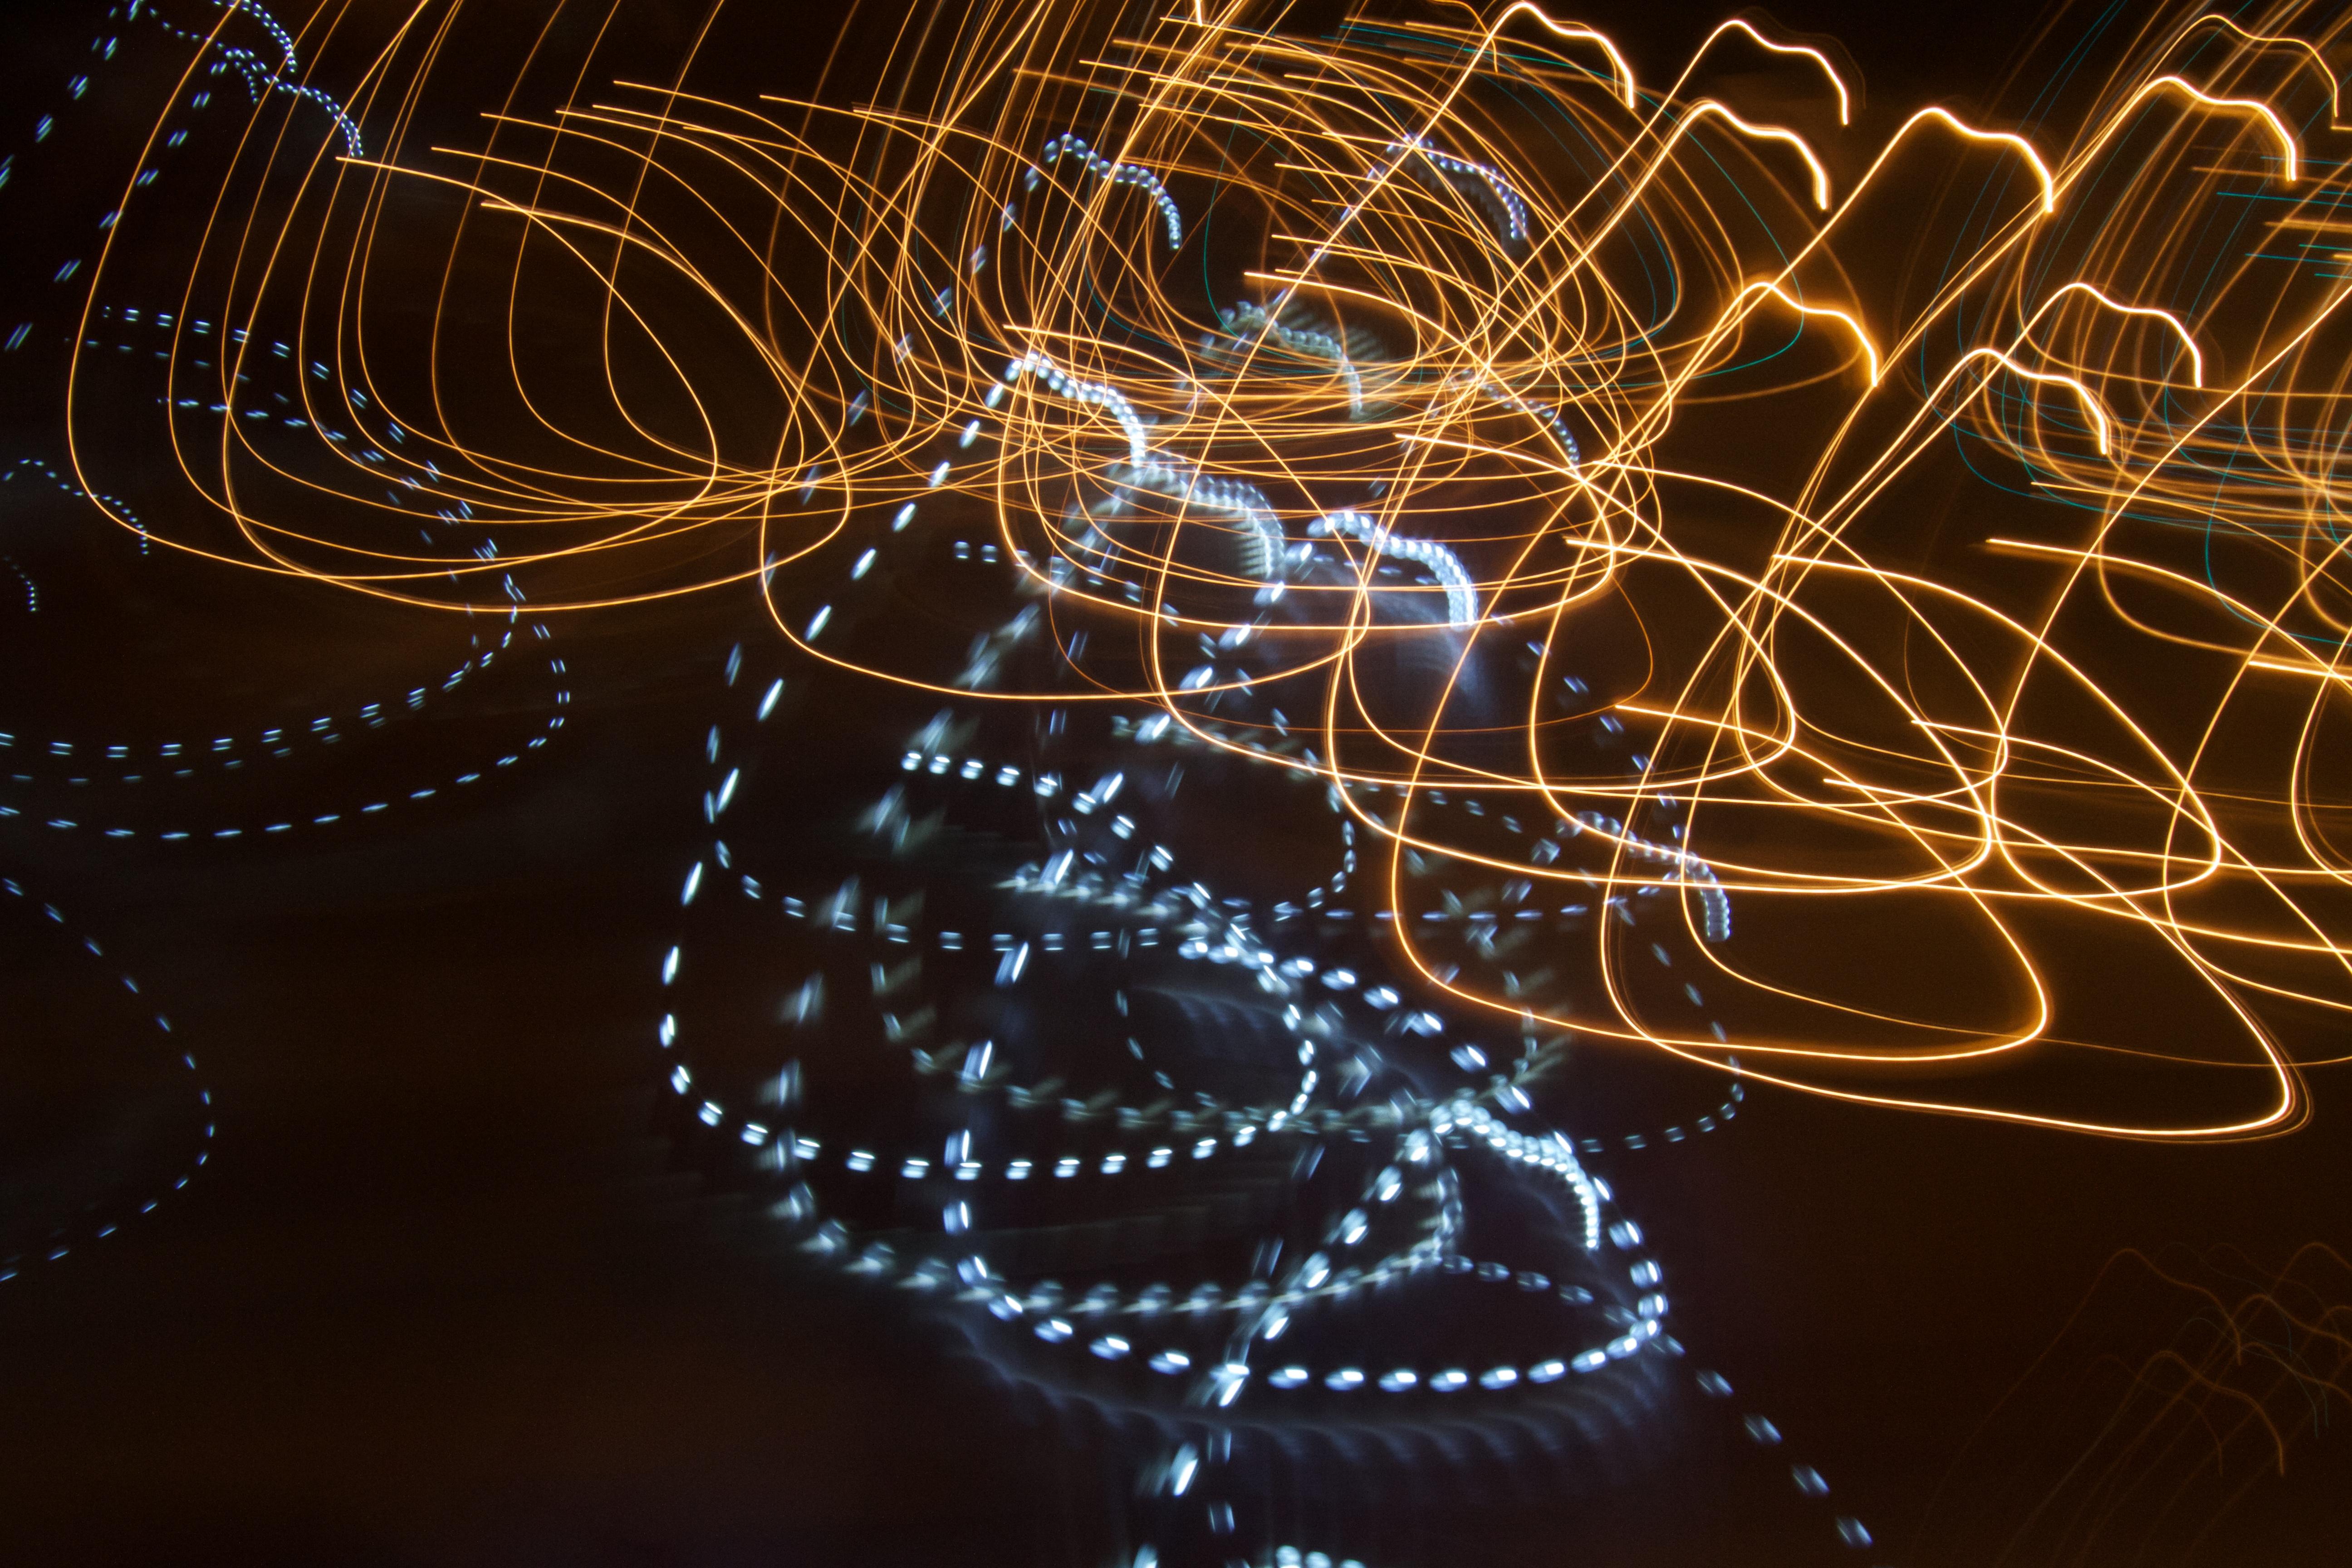 Light Line Darkness Material Circle Invertebrate Spider Web Lightpainting Symmetry Macro Photography Christmas Lights Fractal Art